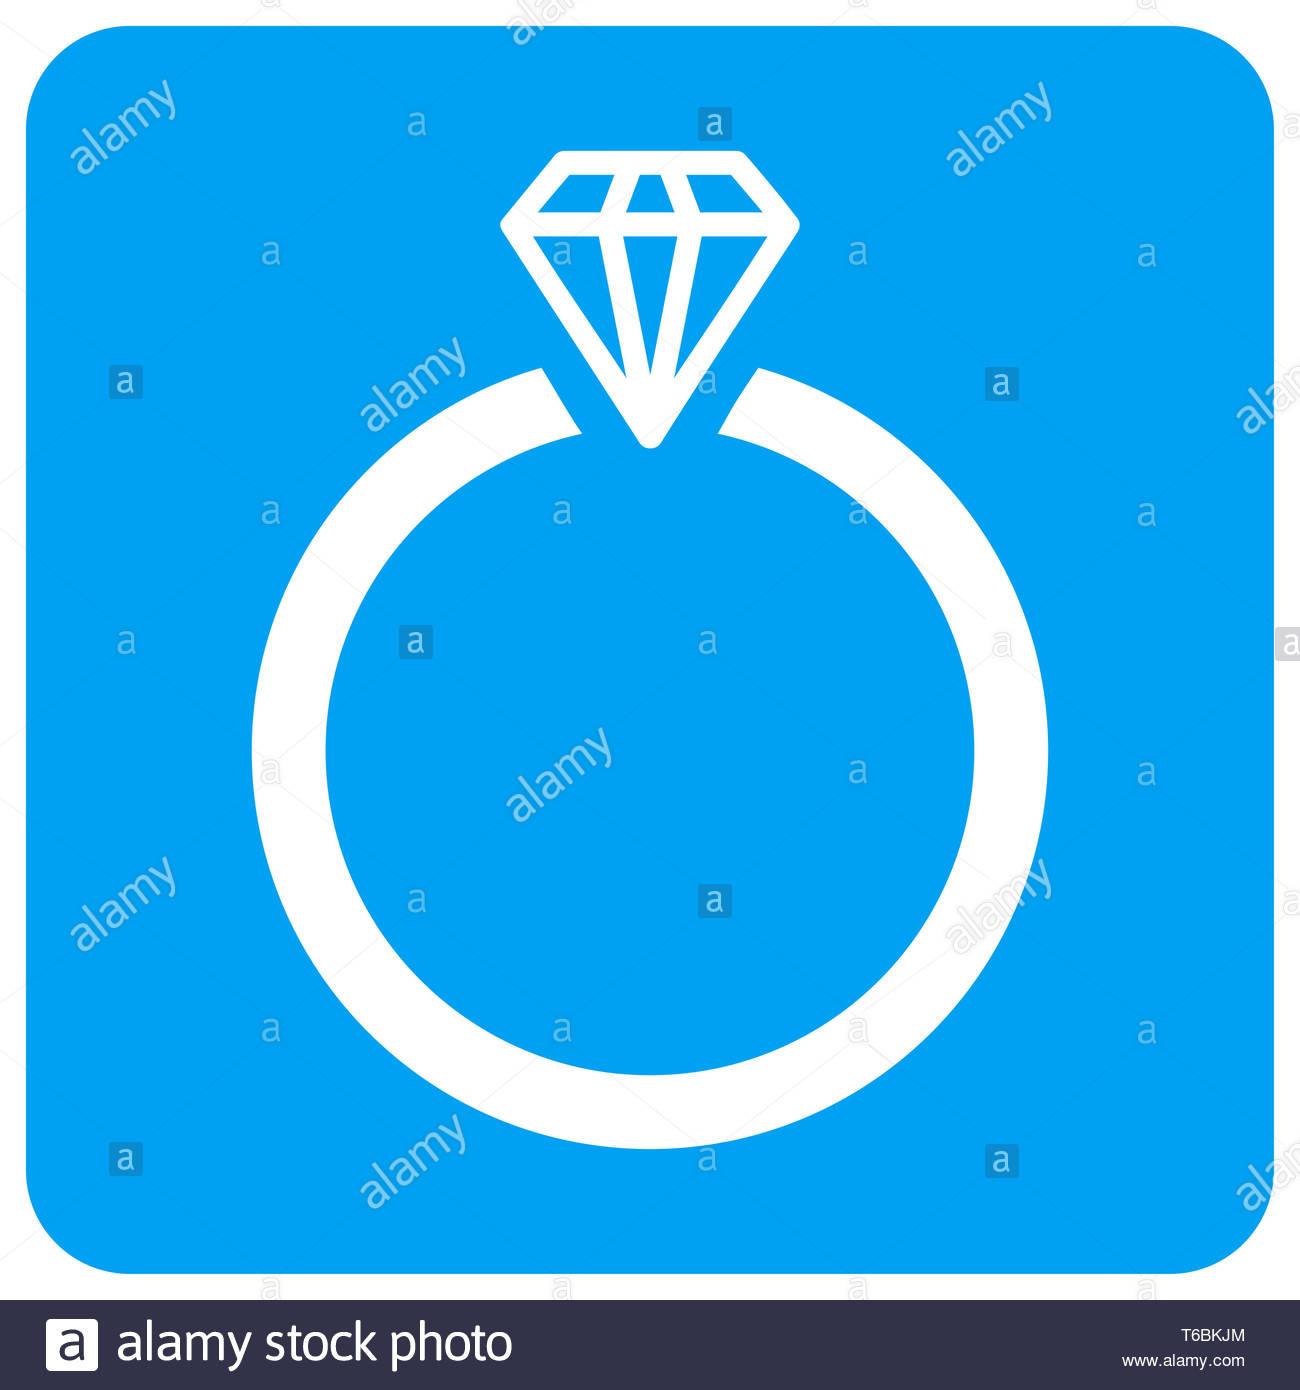 Diamond Ring Rounded Square Raster Icon Stock Photo